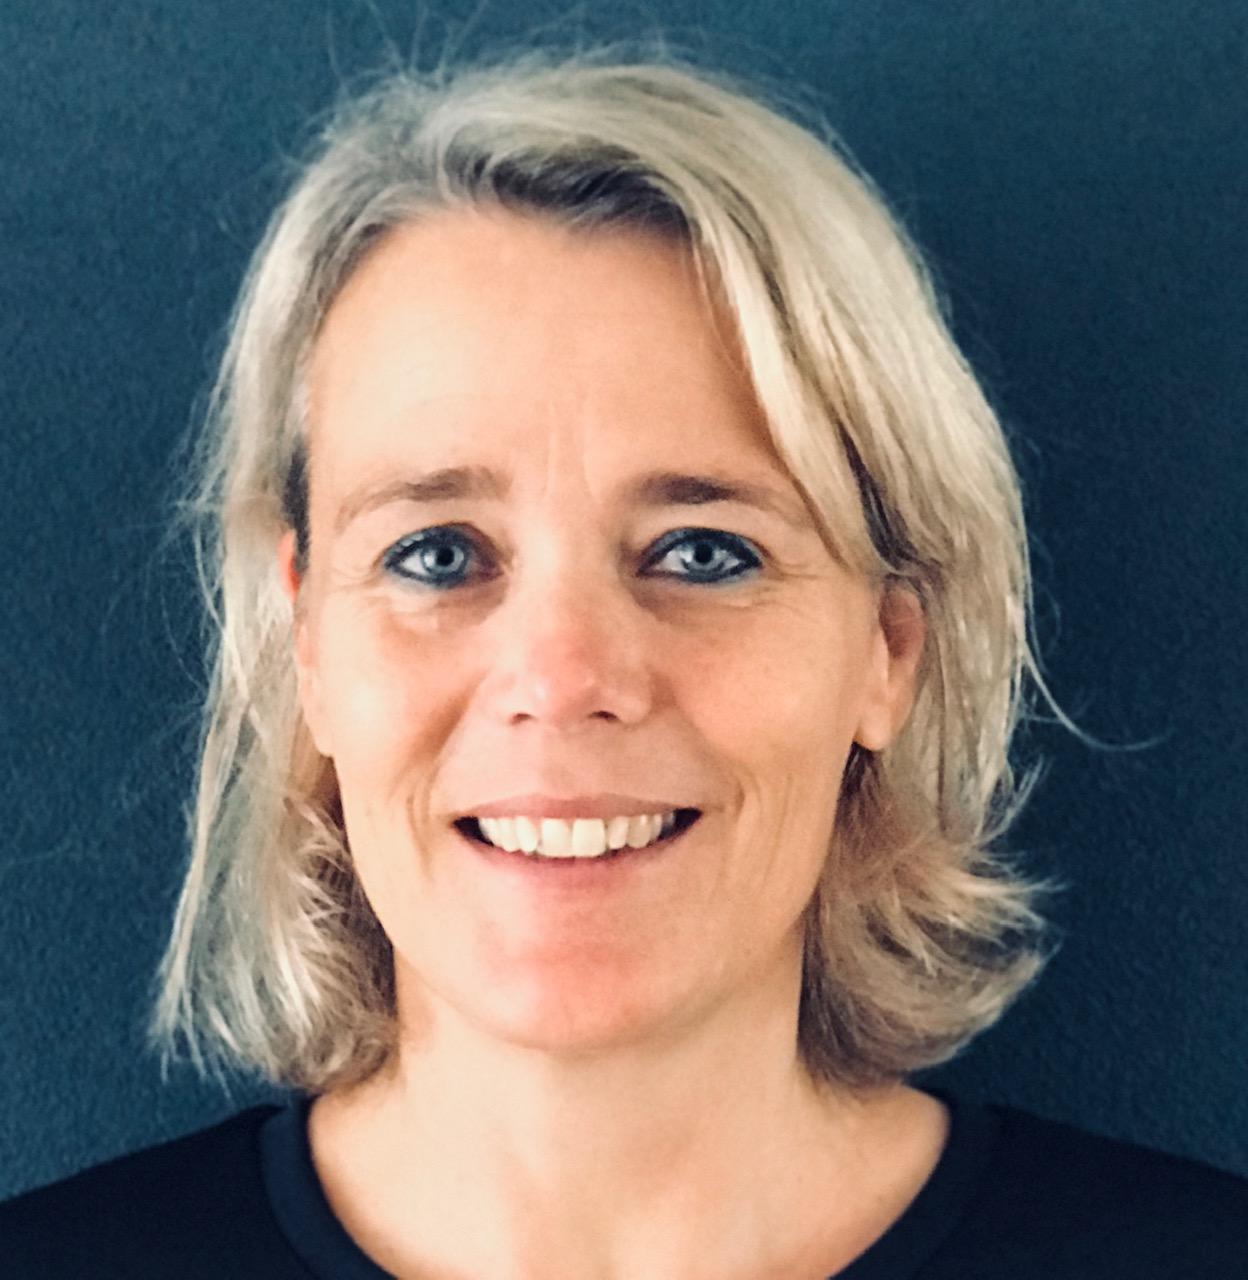 Chantal Nijhuis